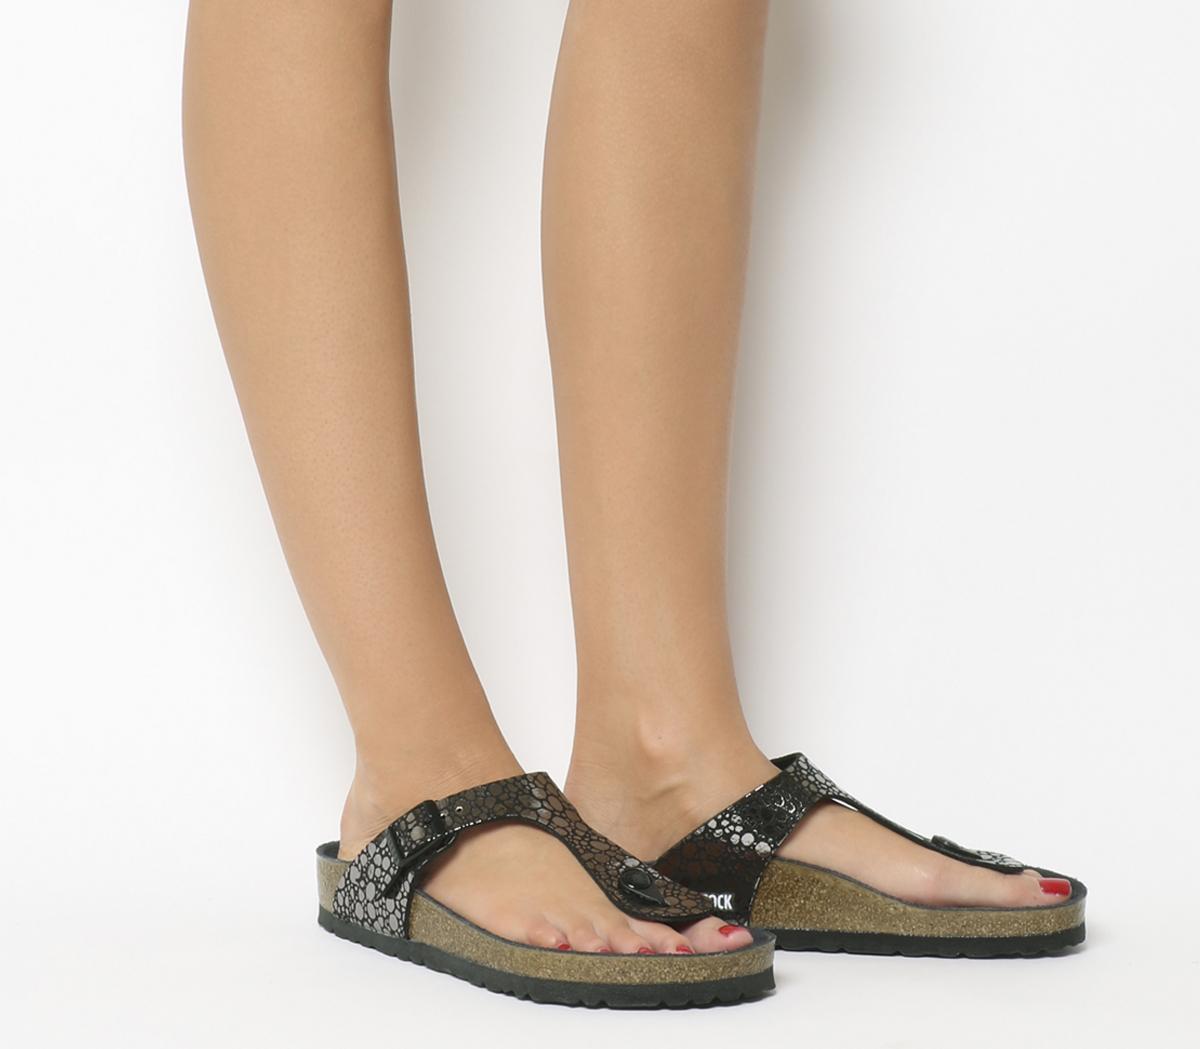 Gizeh Toe Thong Sandals